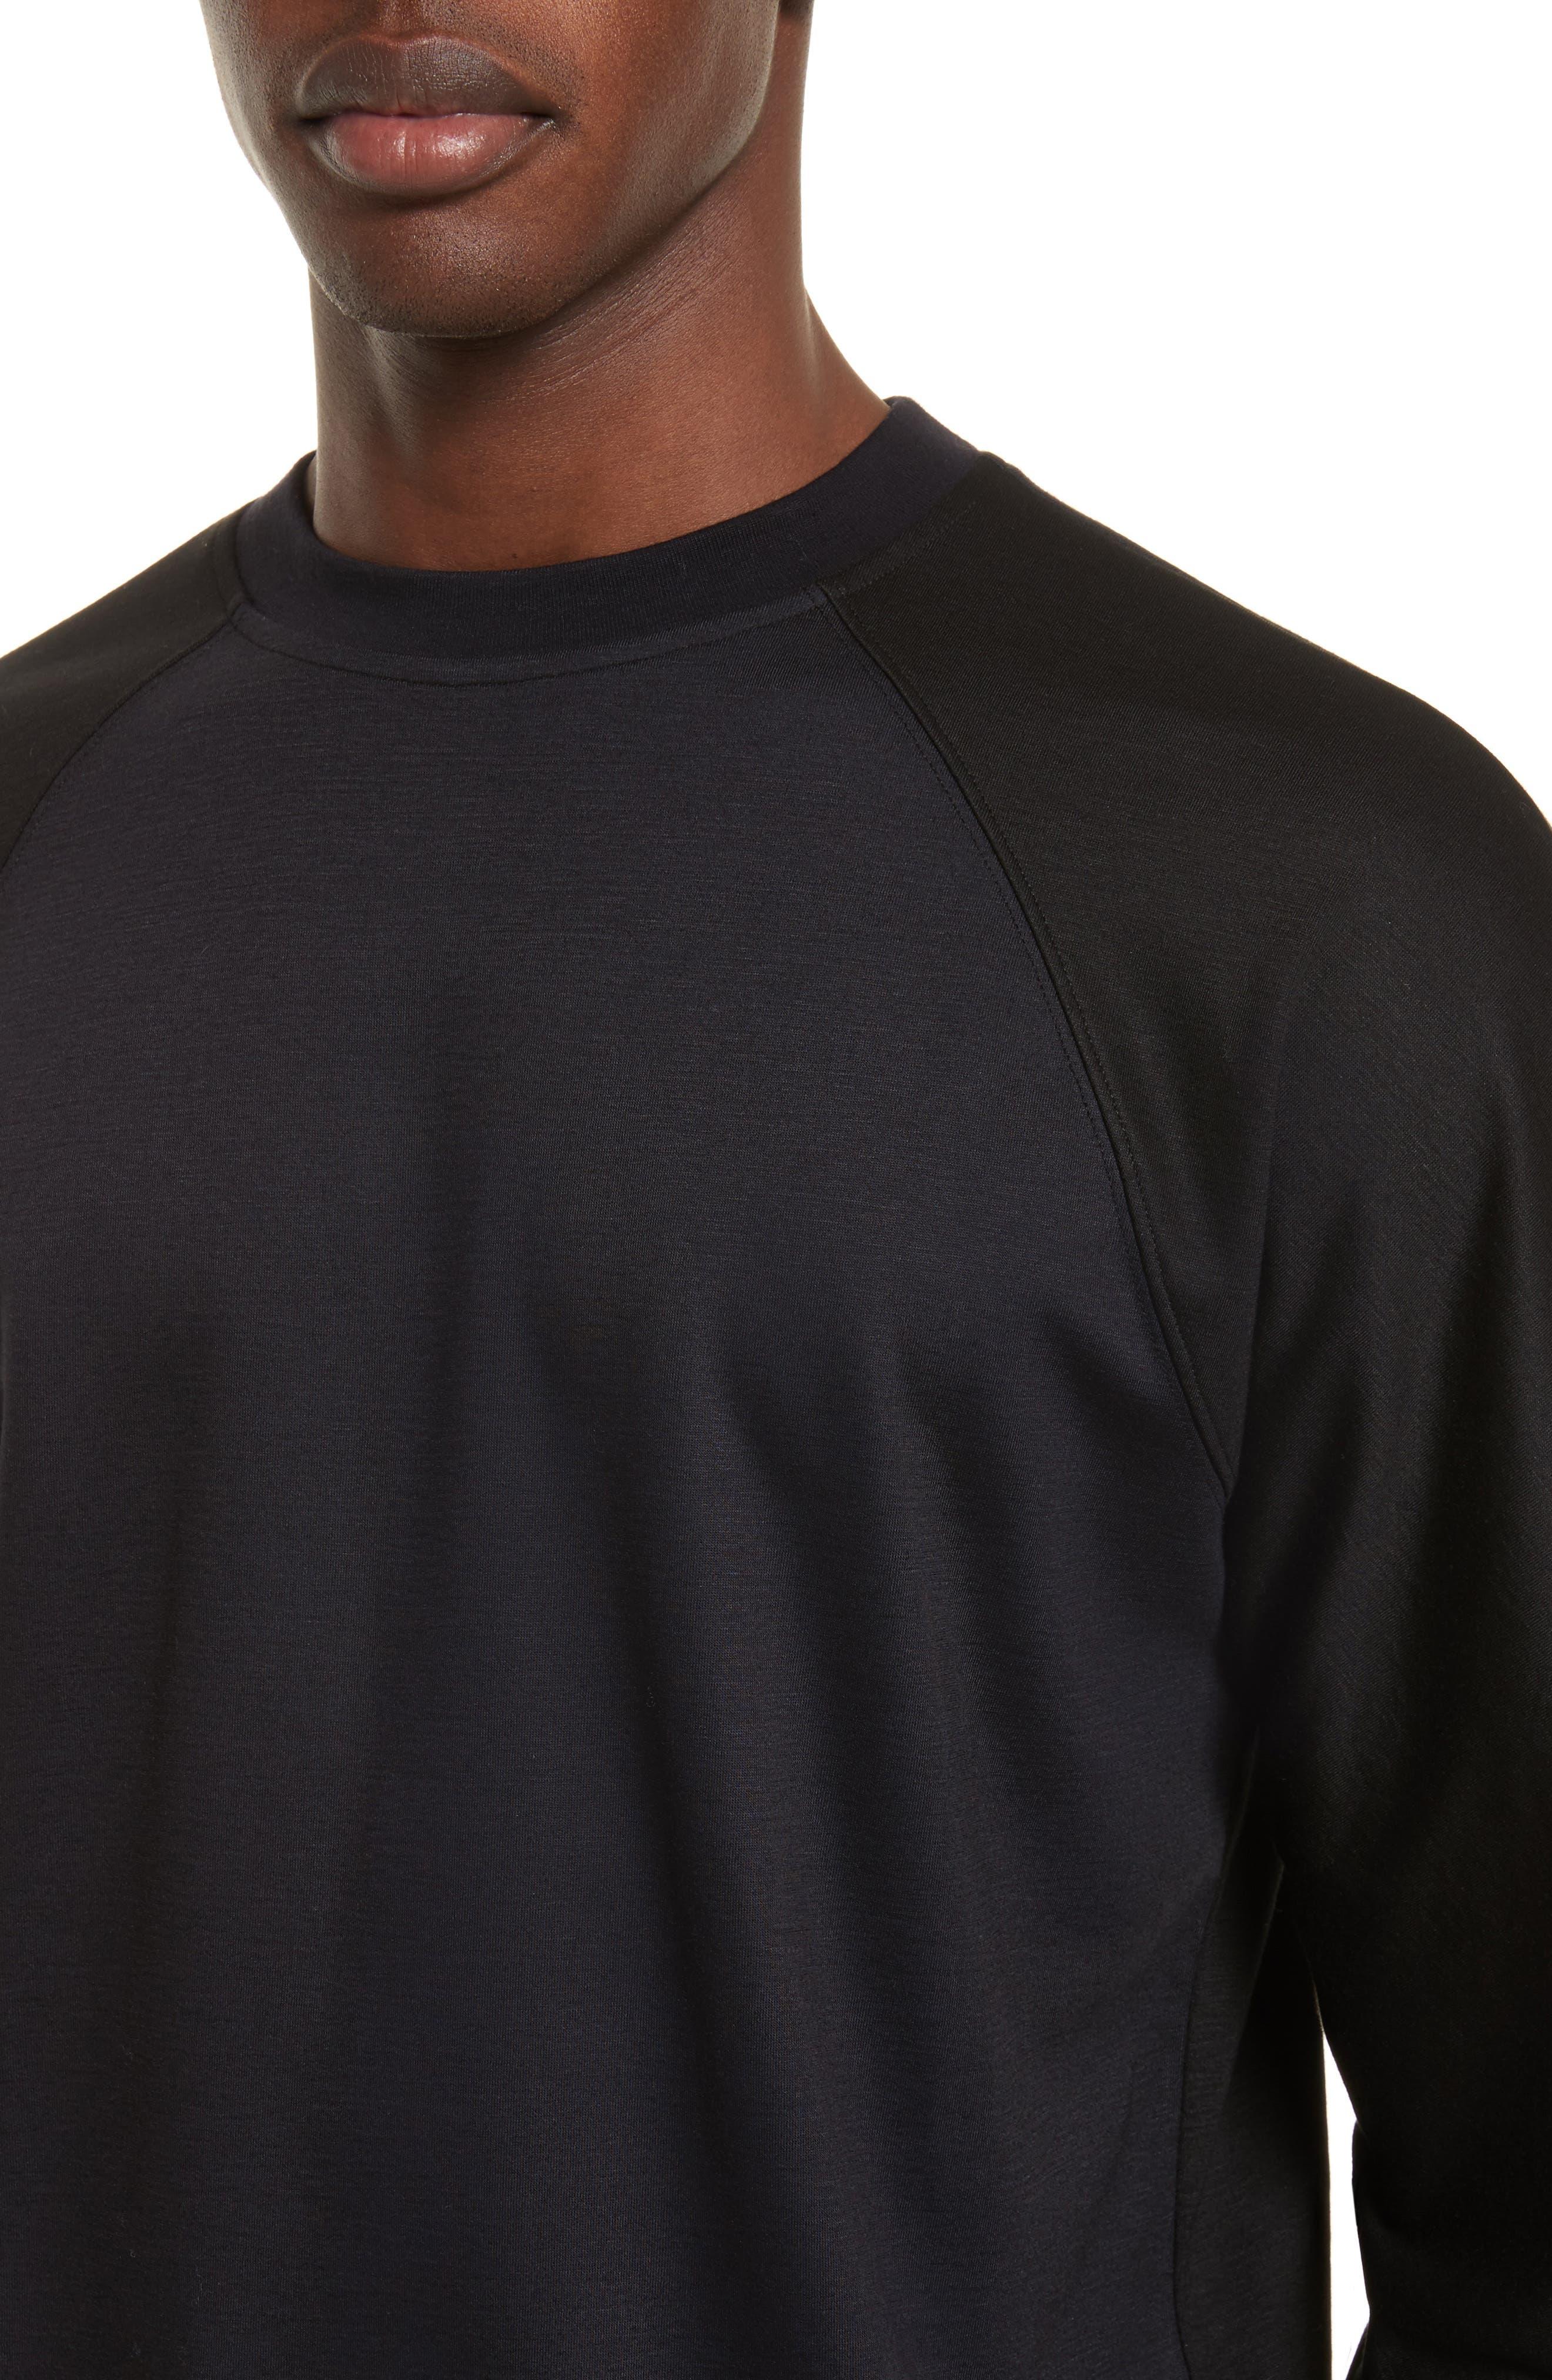 Crewneck Sweatshirt,                             Alternate thumbnail 4, color,                             001